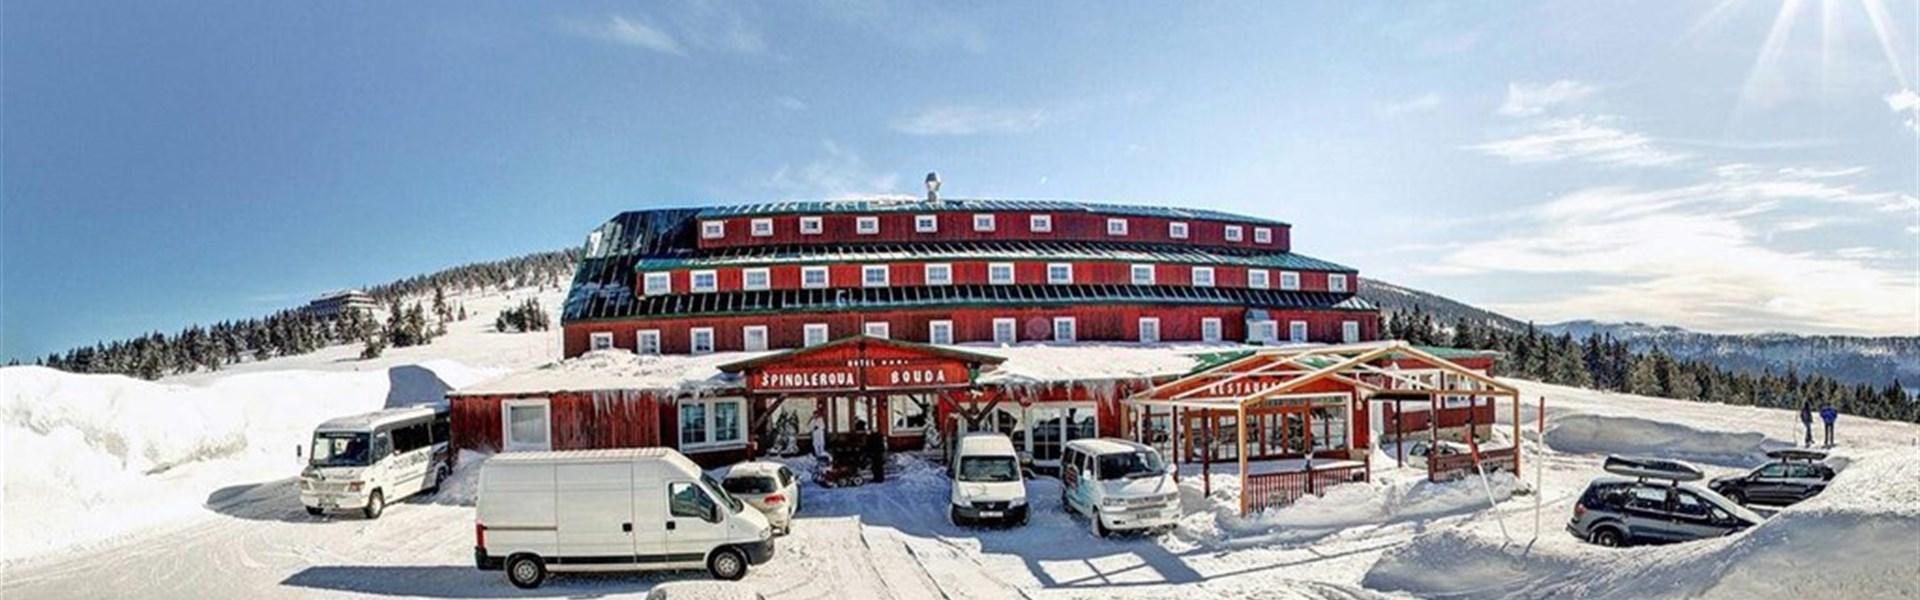 Marco Polo - Hotel Špindlerova Bouda - zima -